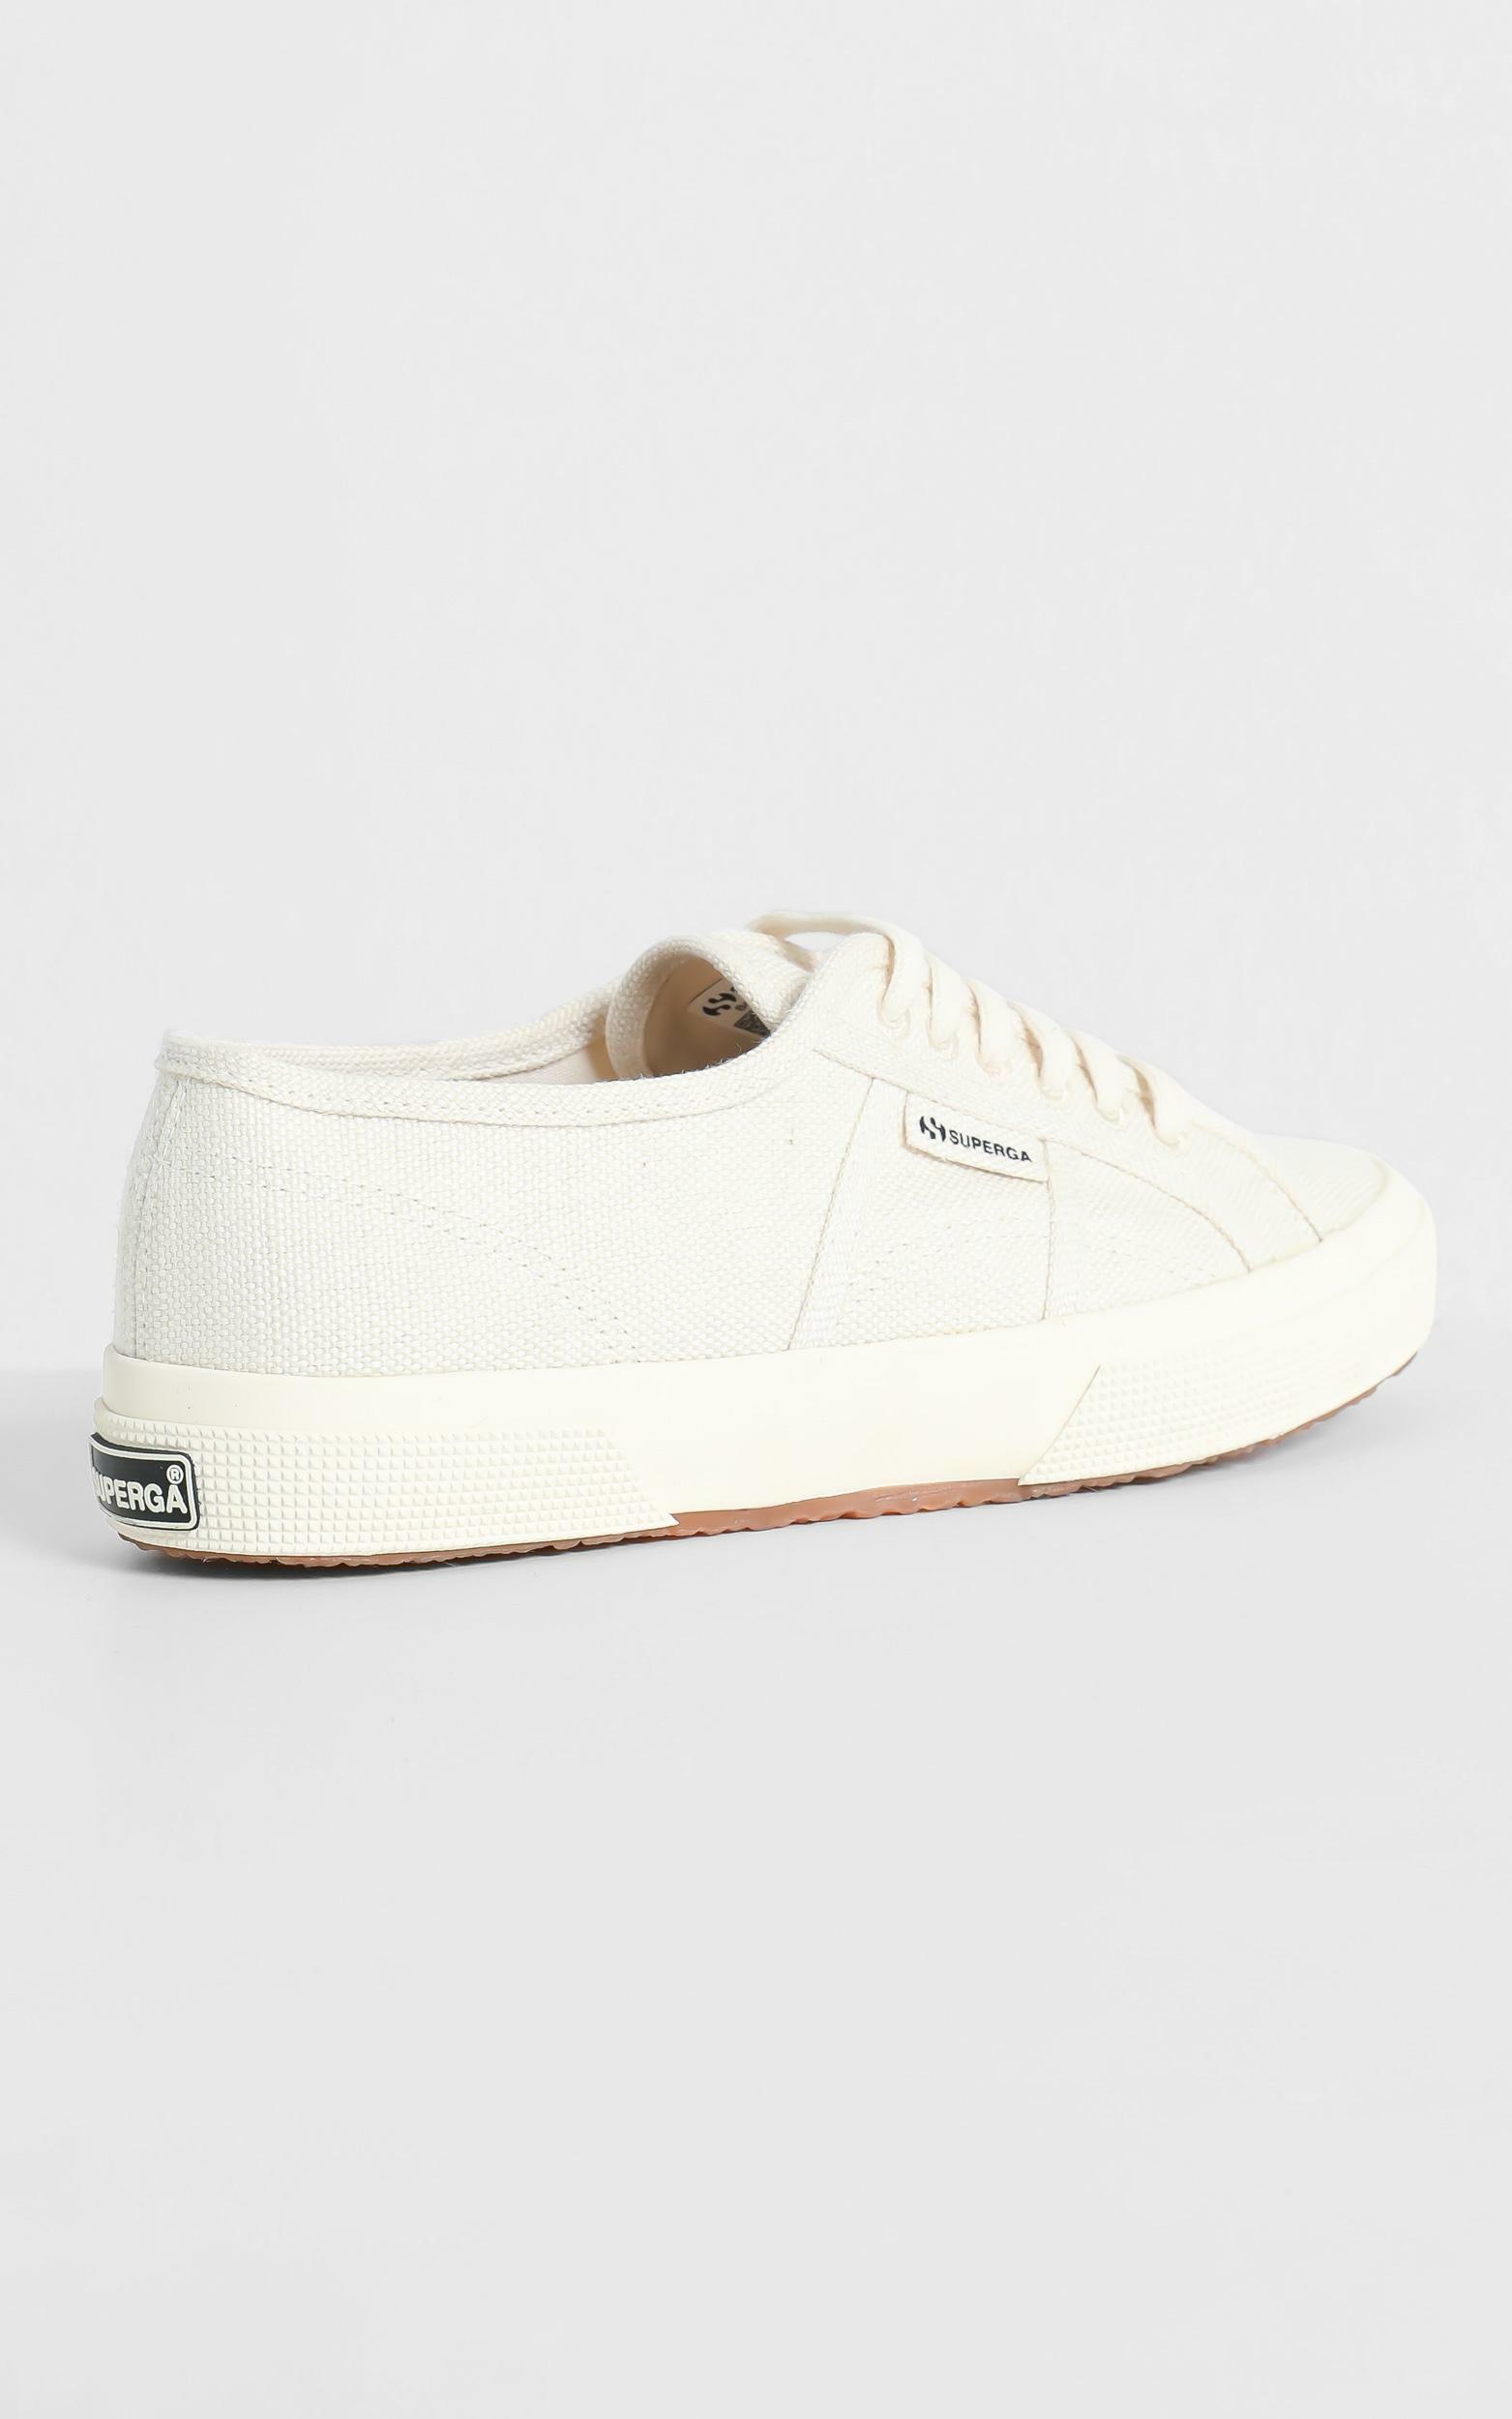 Superga - 2750 Organic Cotton Sneaker in natural beige - 5, Beige, hi-res image number null